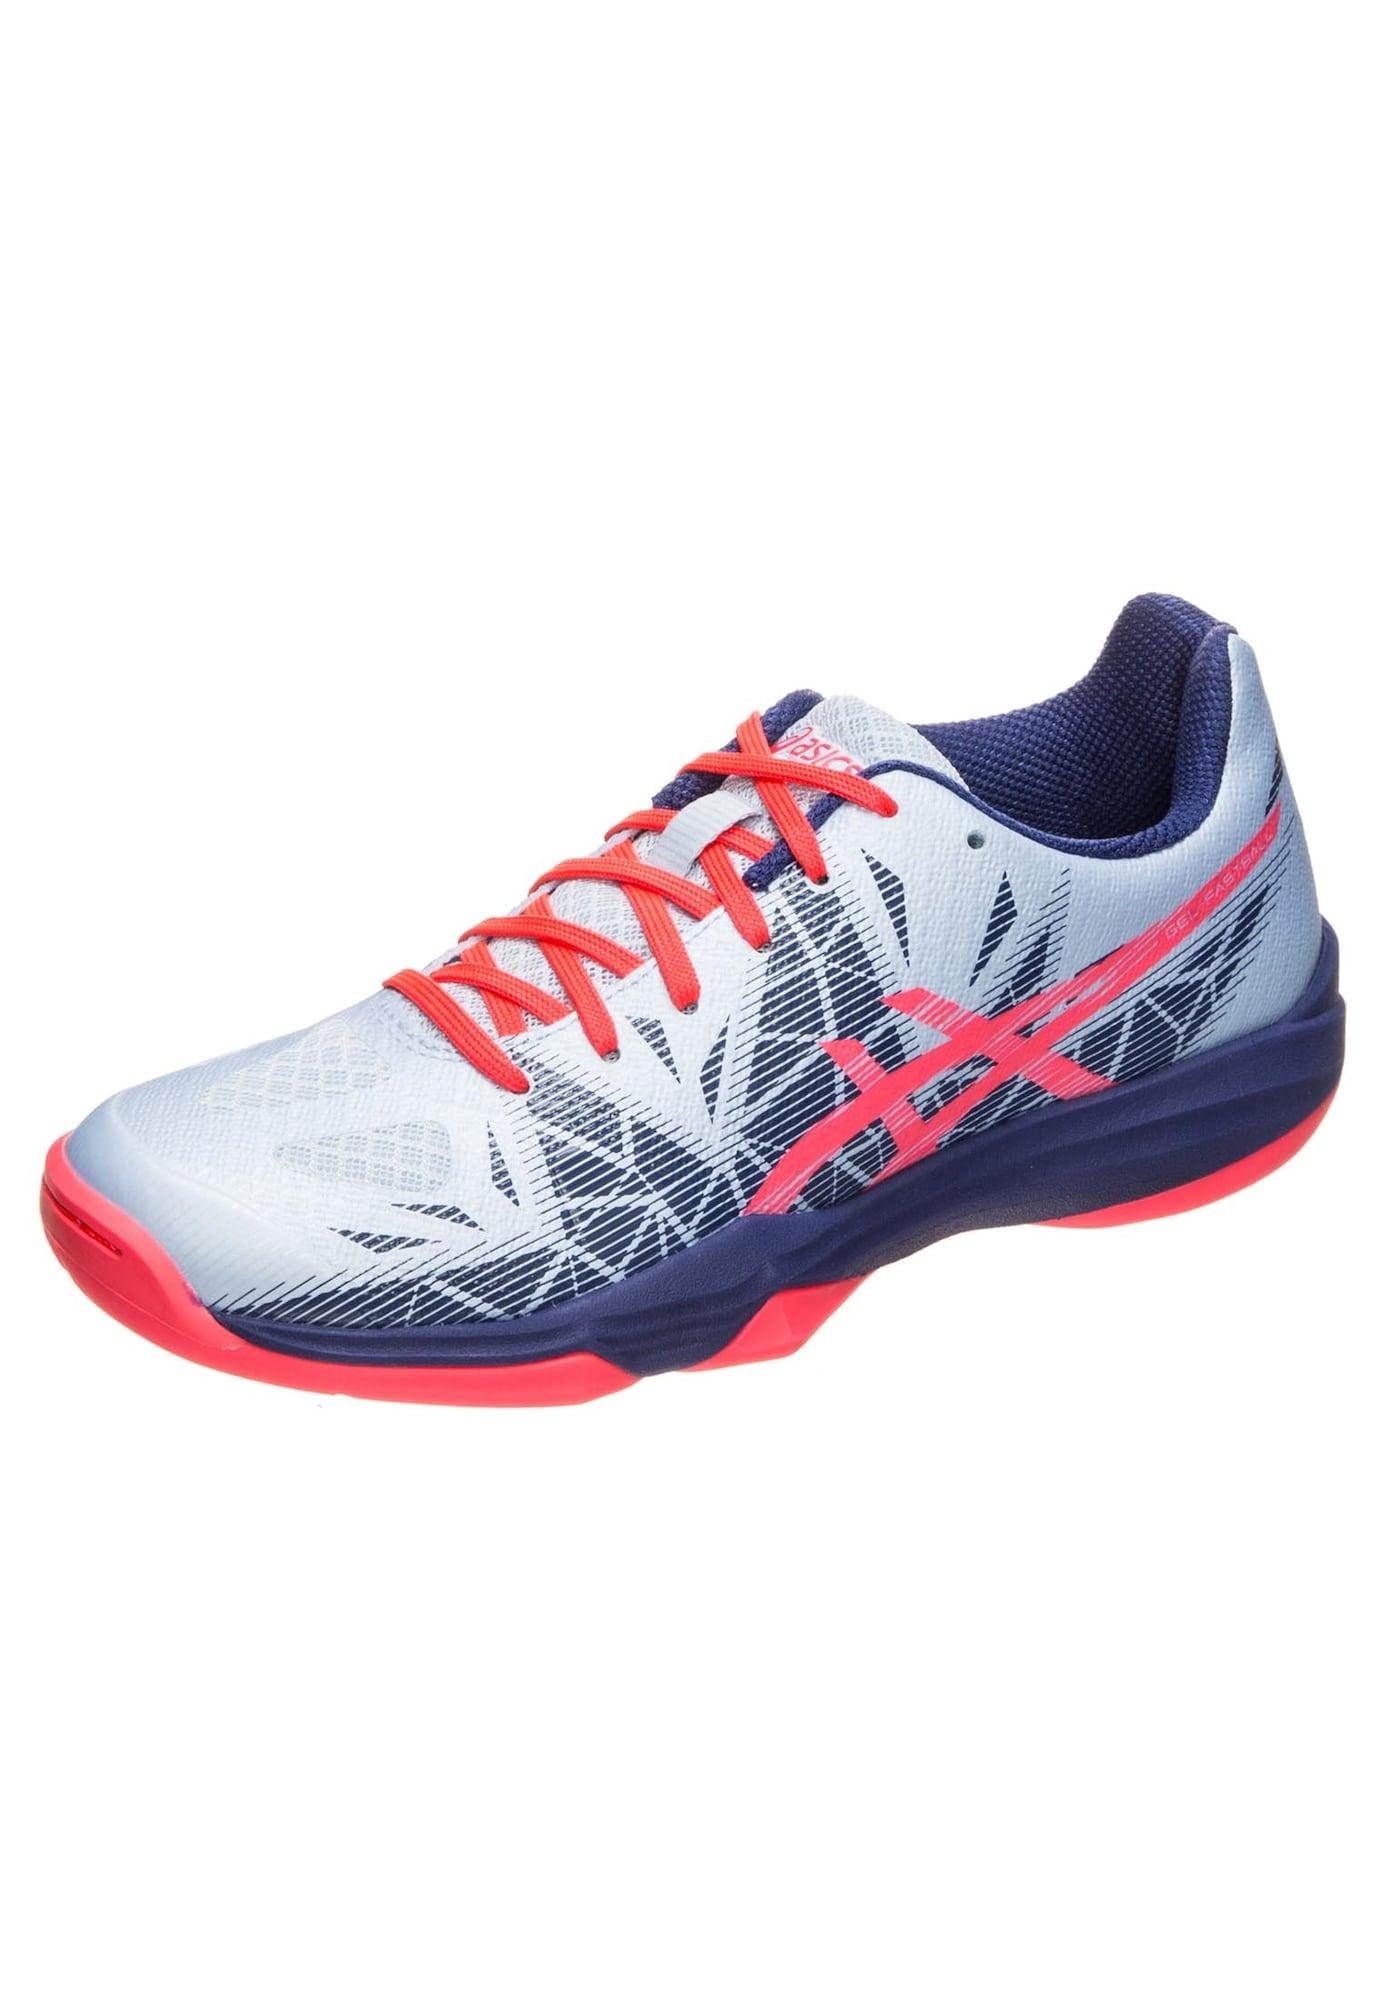 Sportovní boty GEL-Fastball 3  modrá  světlemodrá  pink  bílá ASICS